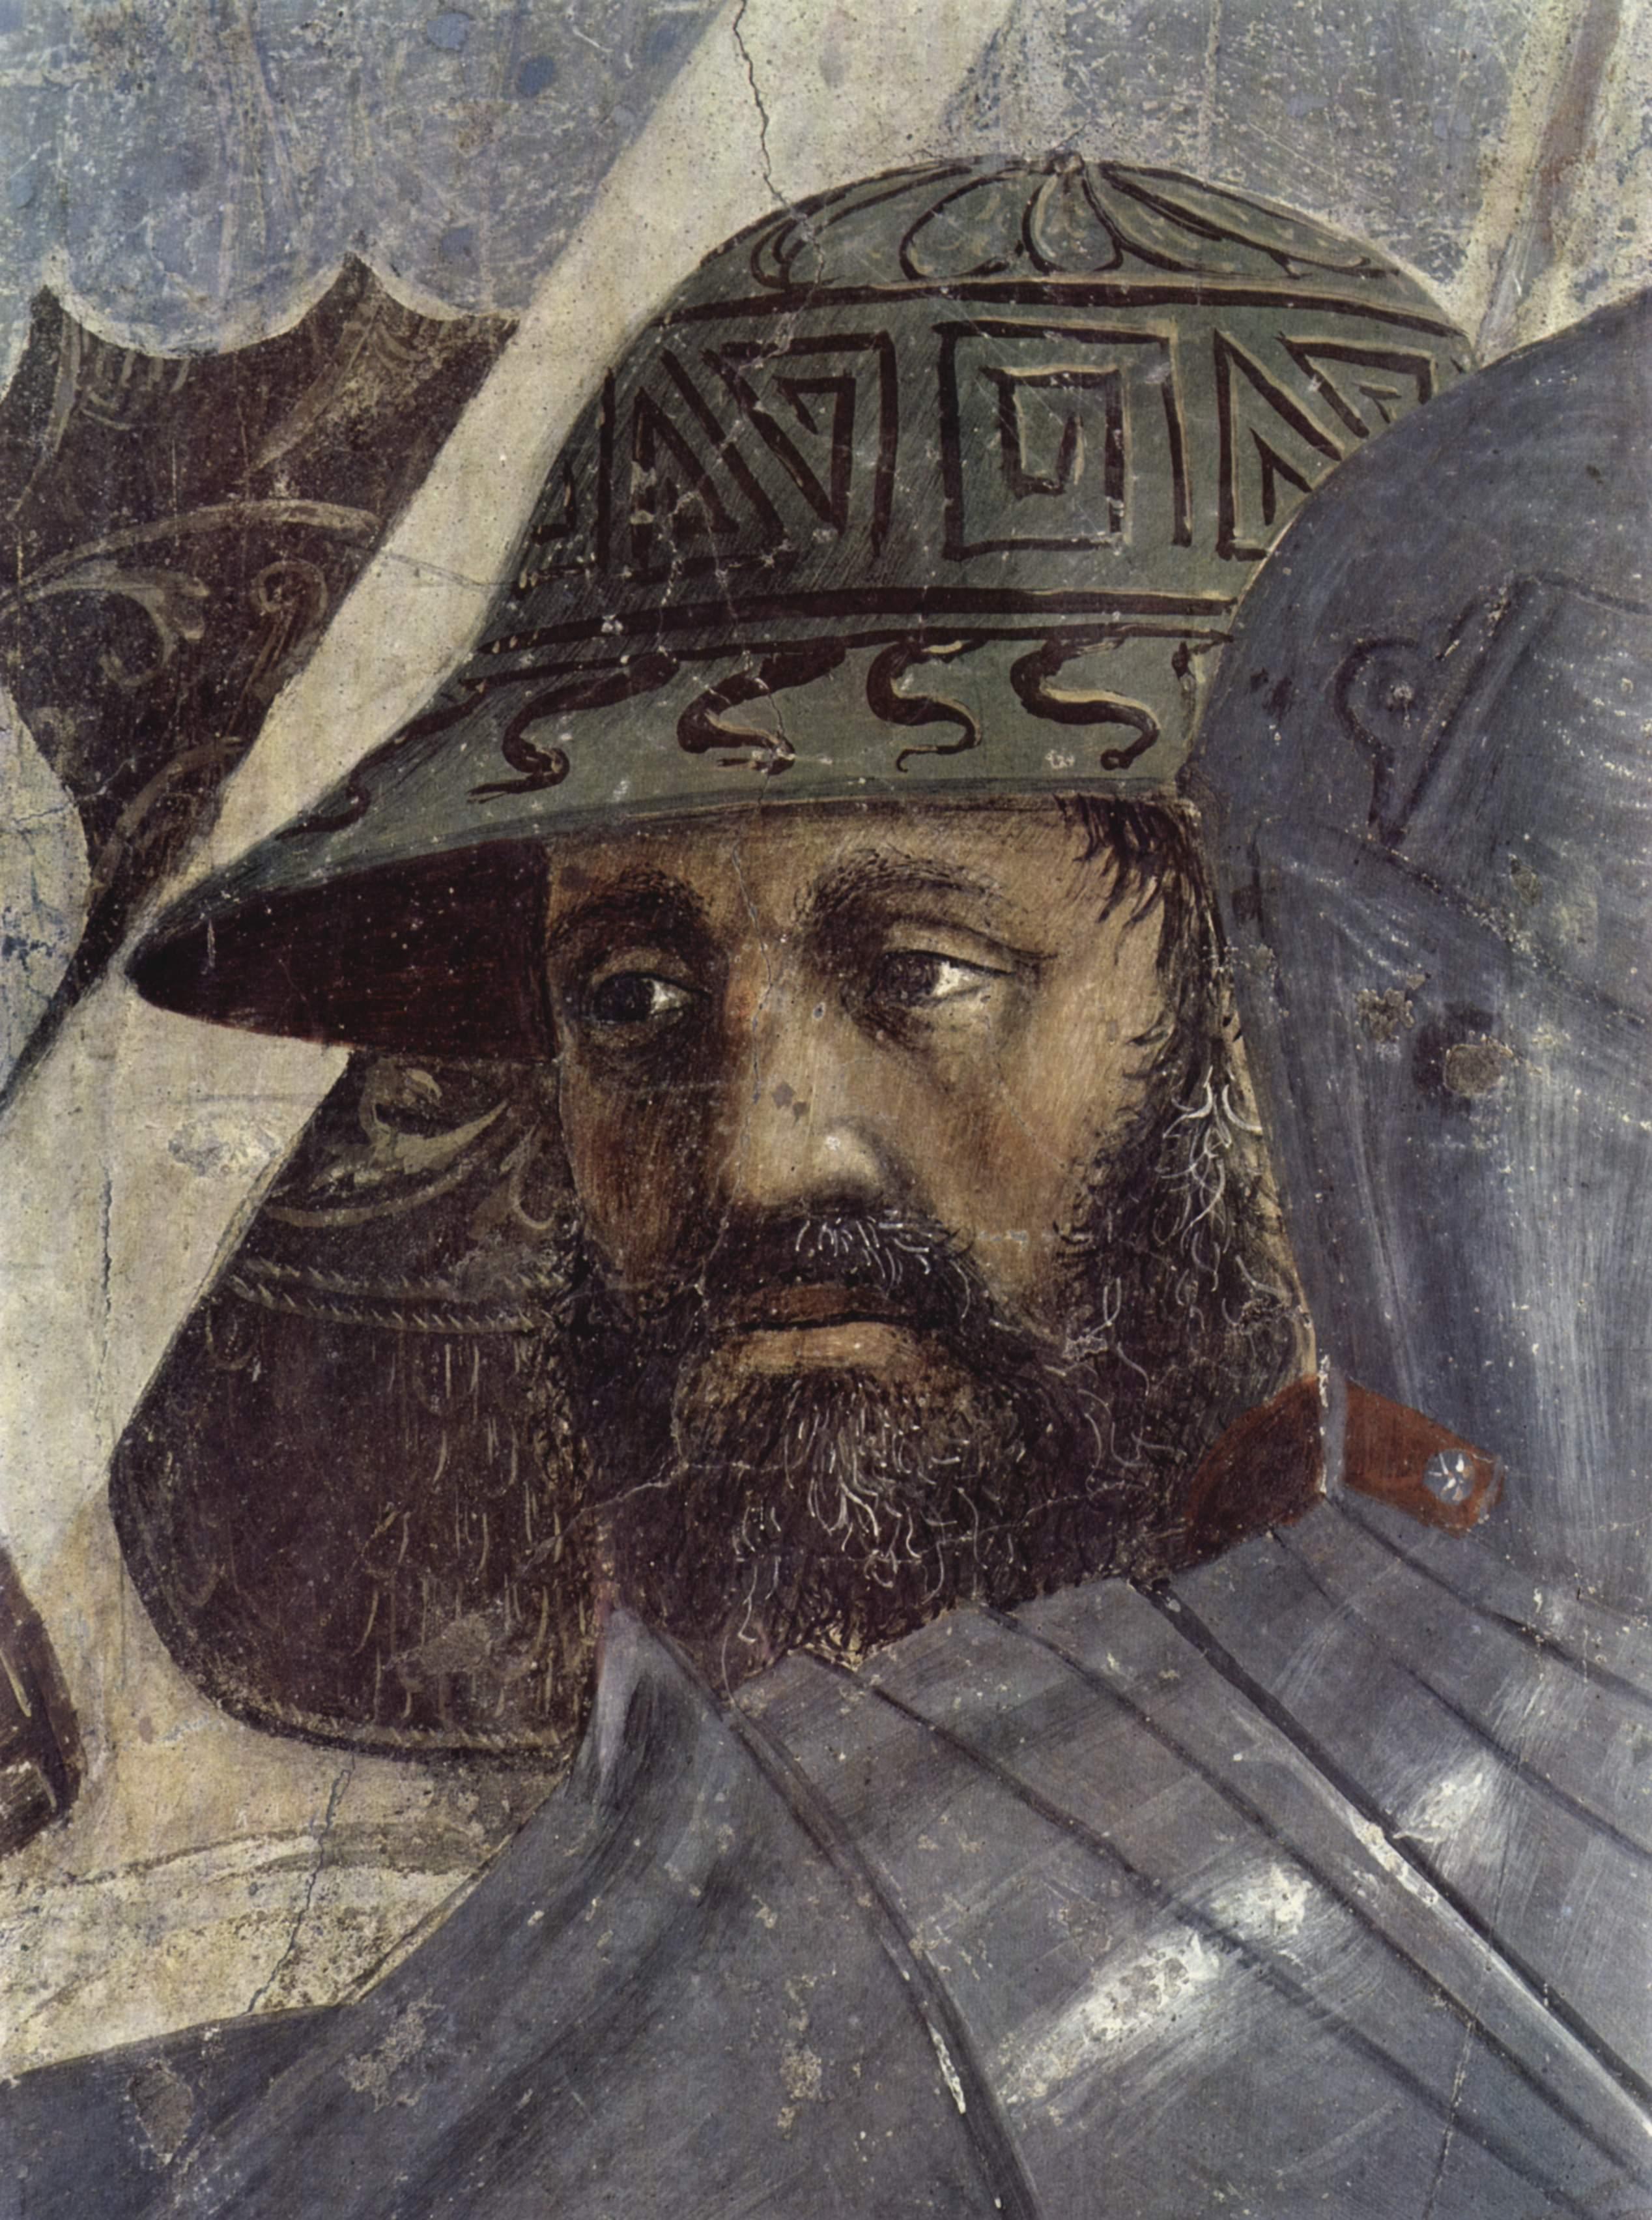 https://upload.wikimedia.org/wikipedia/commons/6/60/Piero_della_Francesca_028.jpg